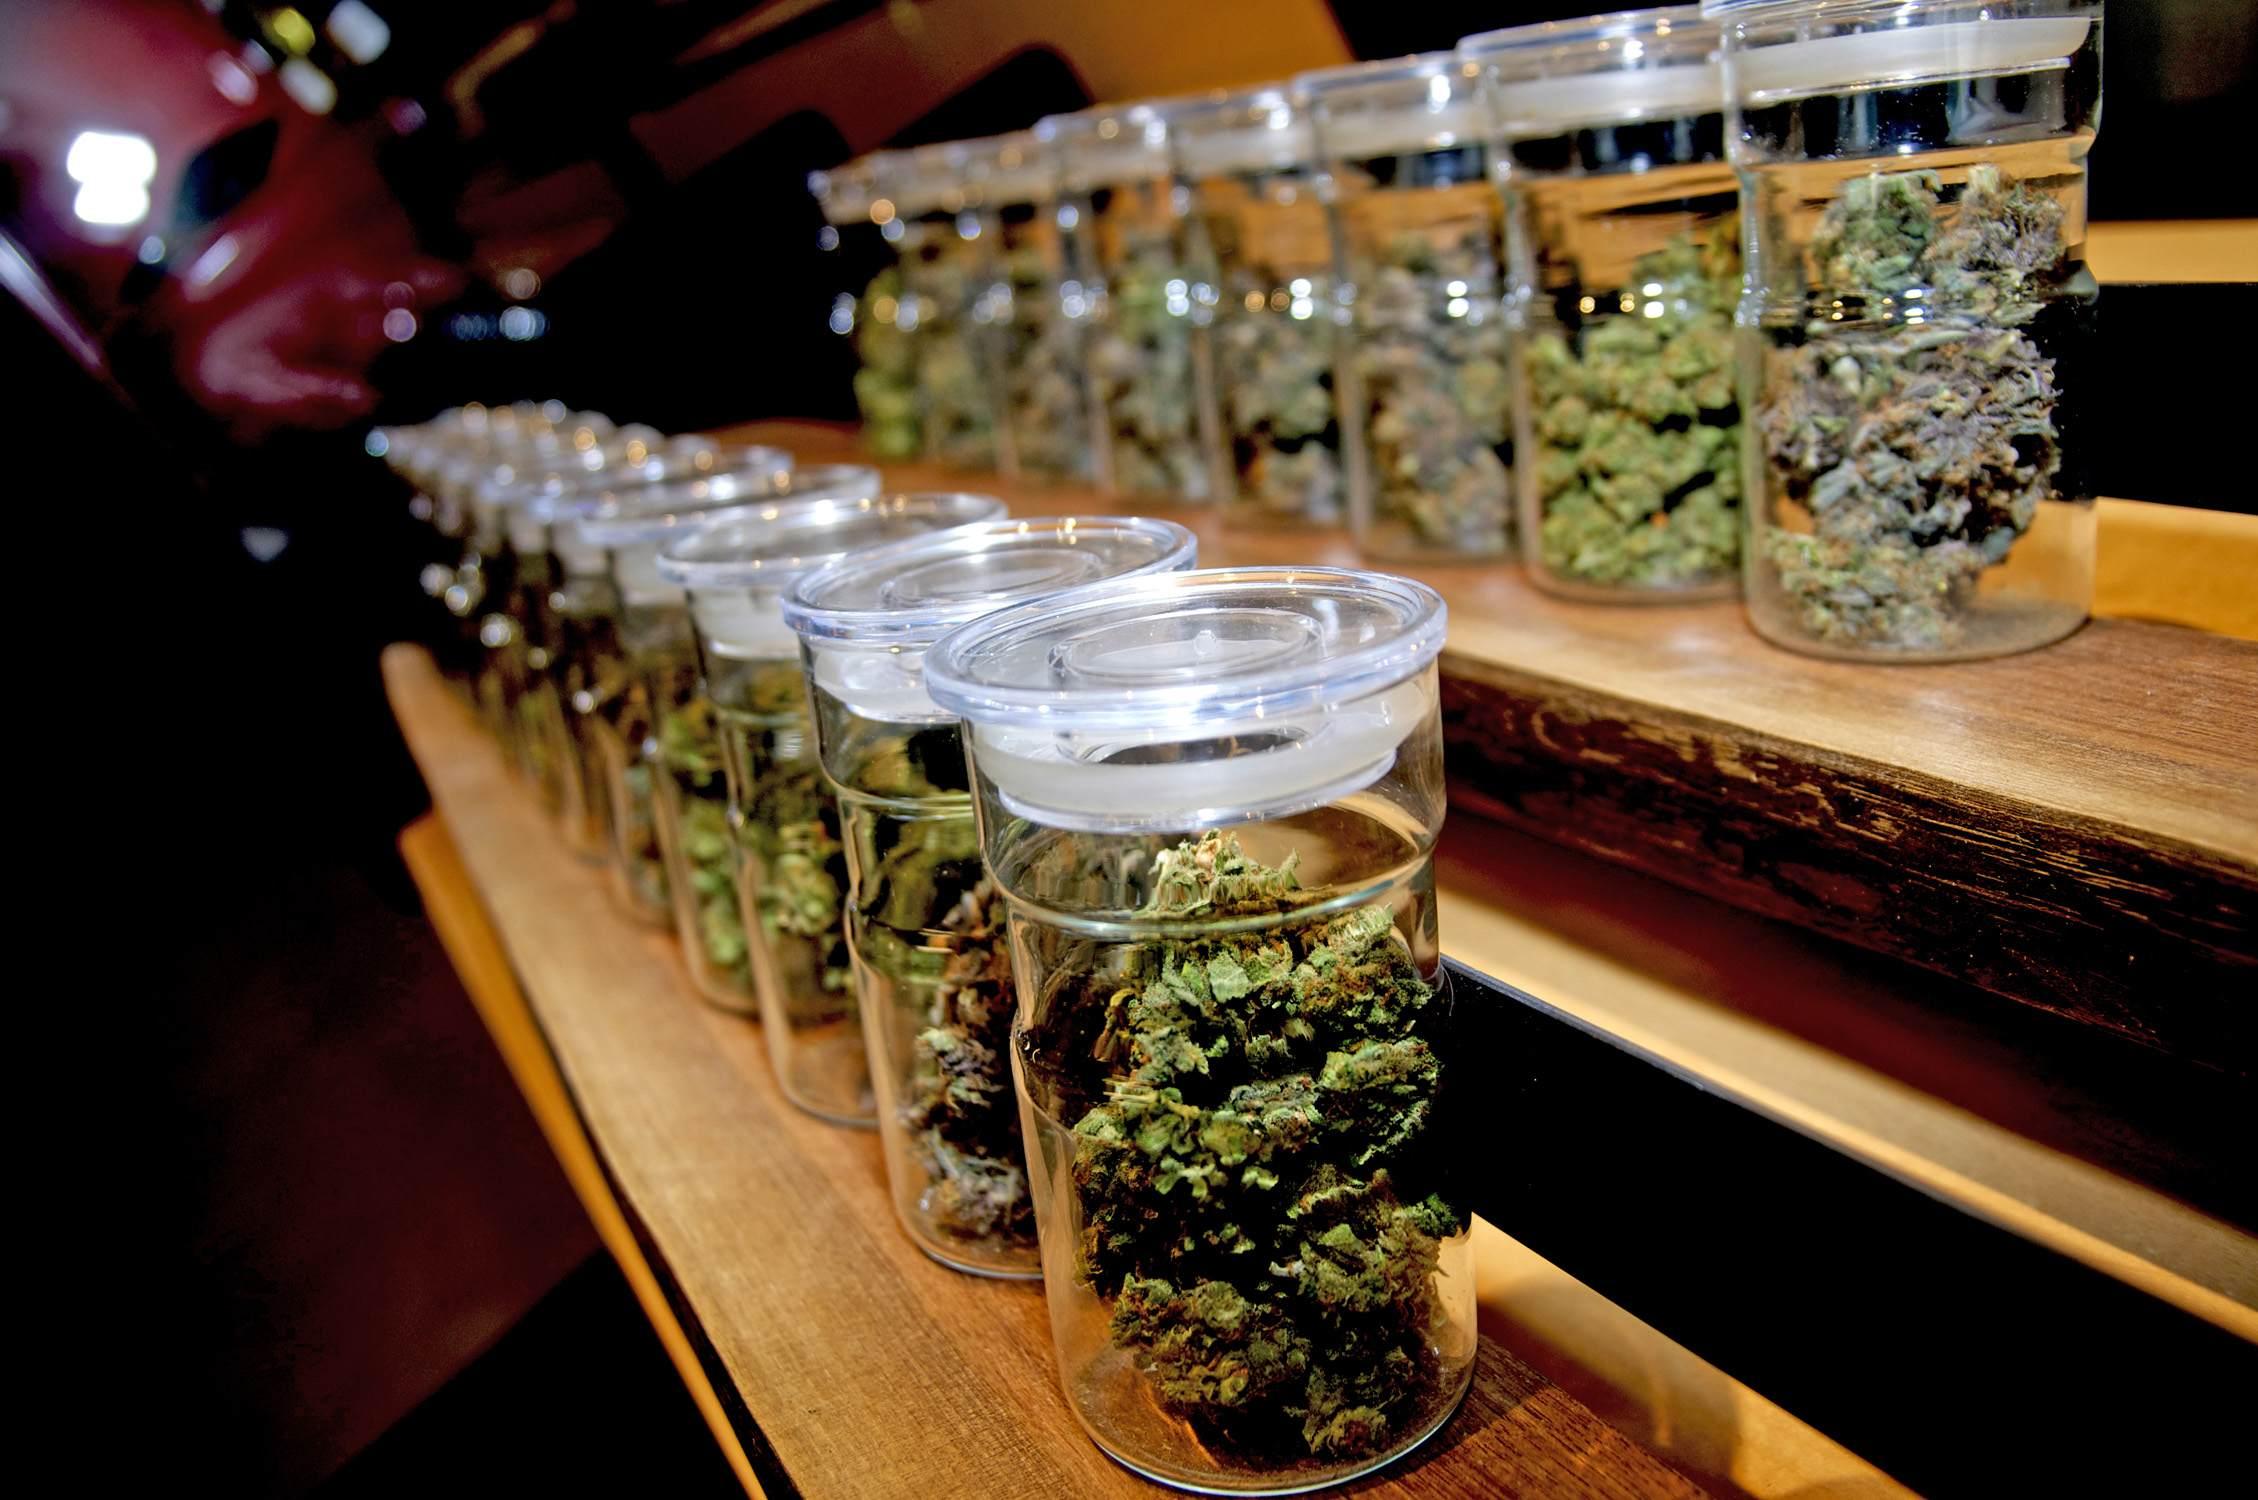 Primer foro sobre el consumo de marihuana